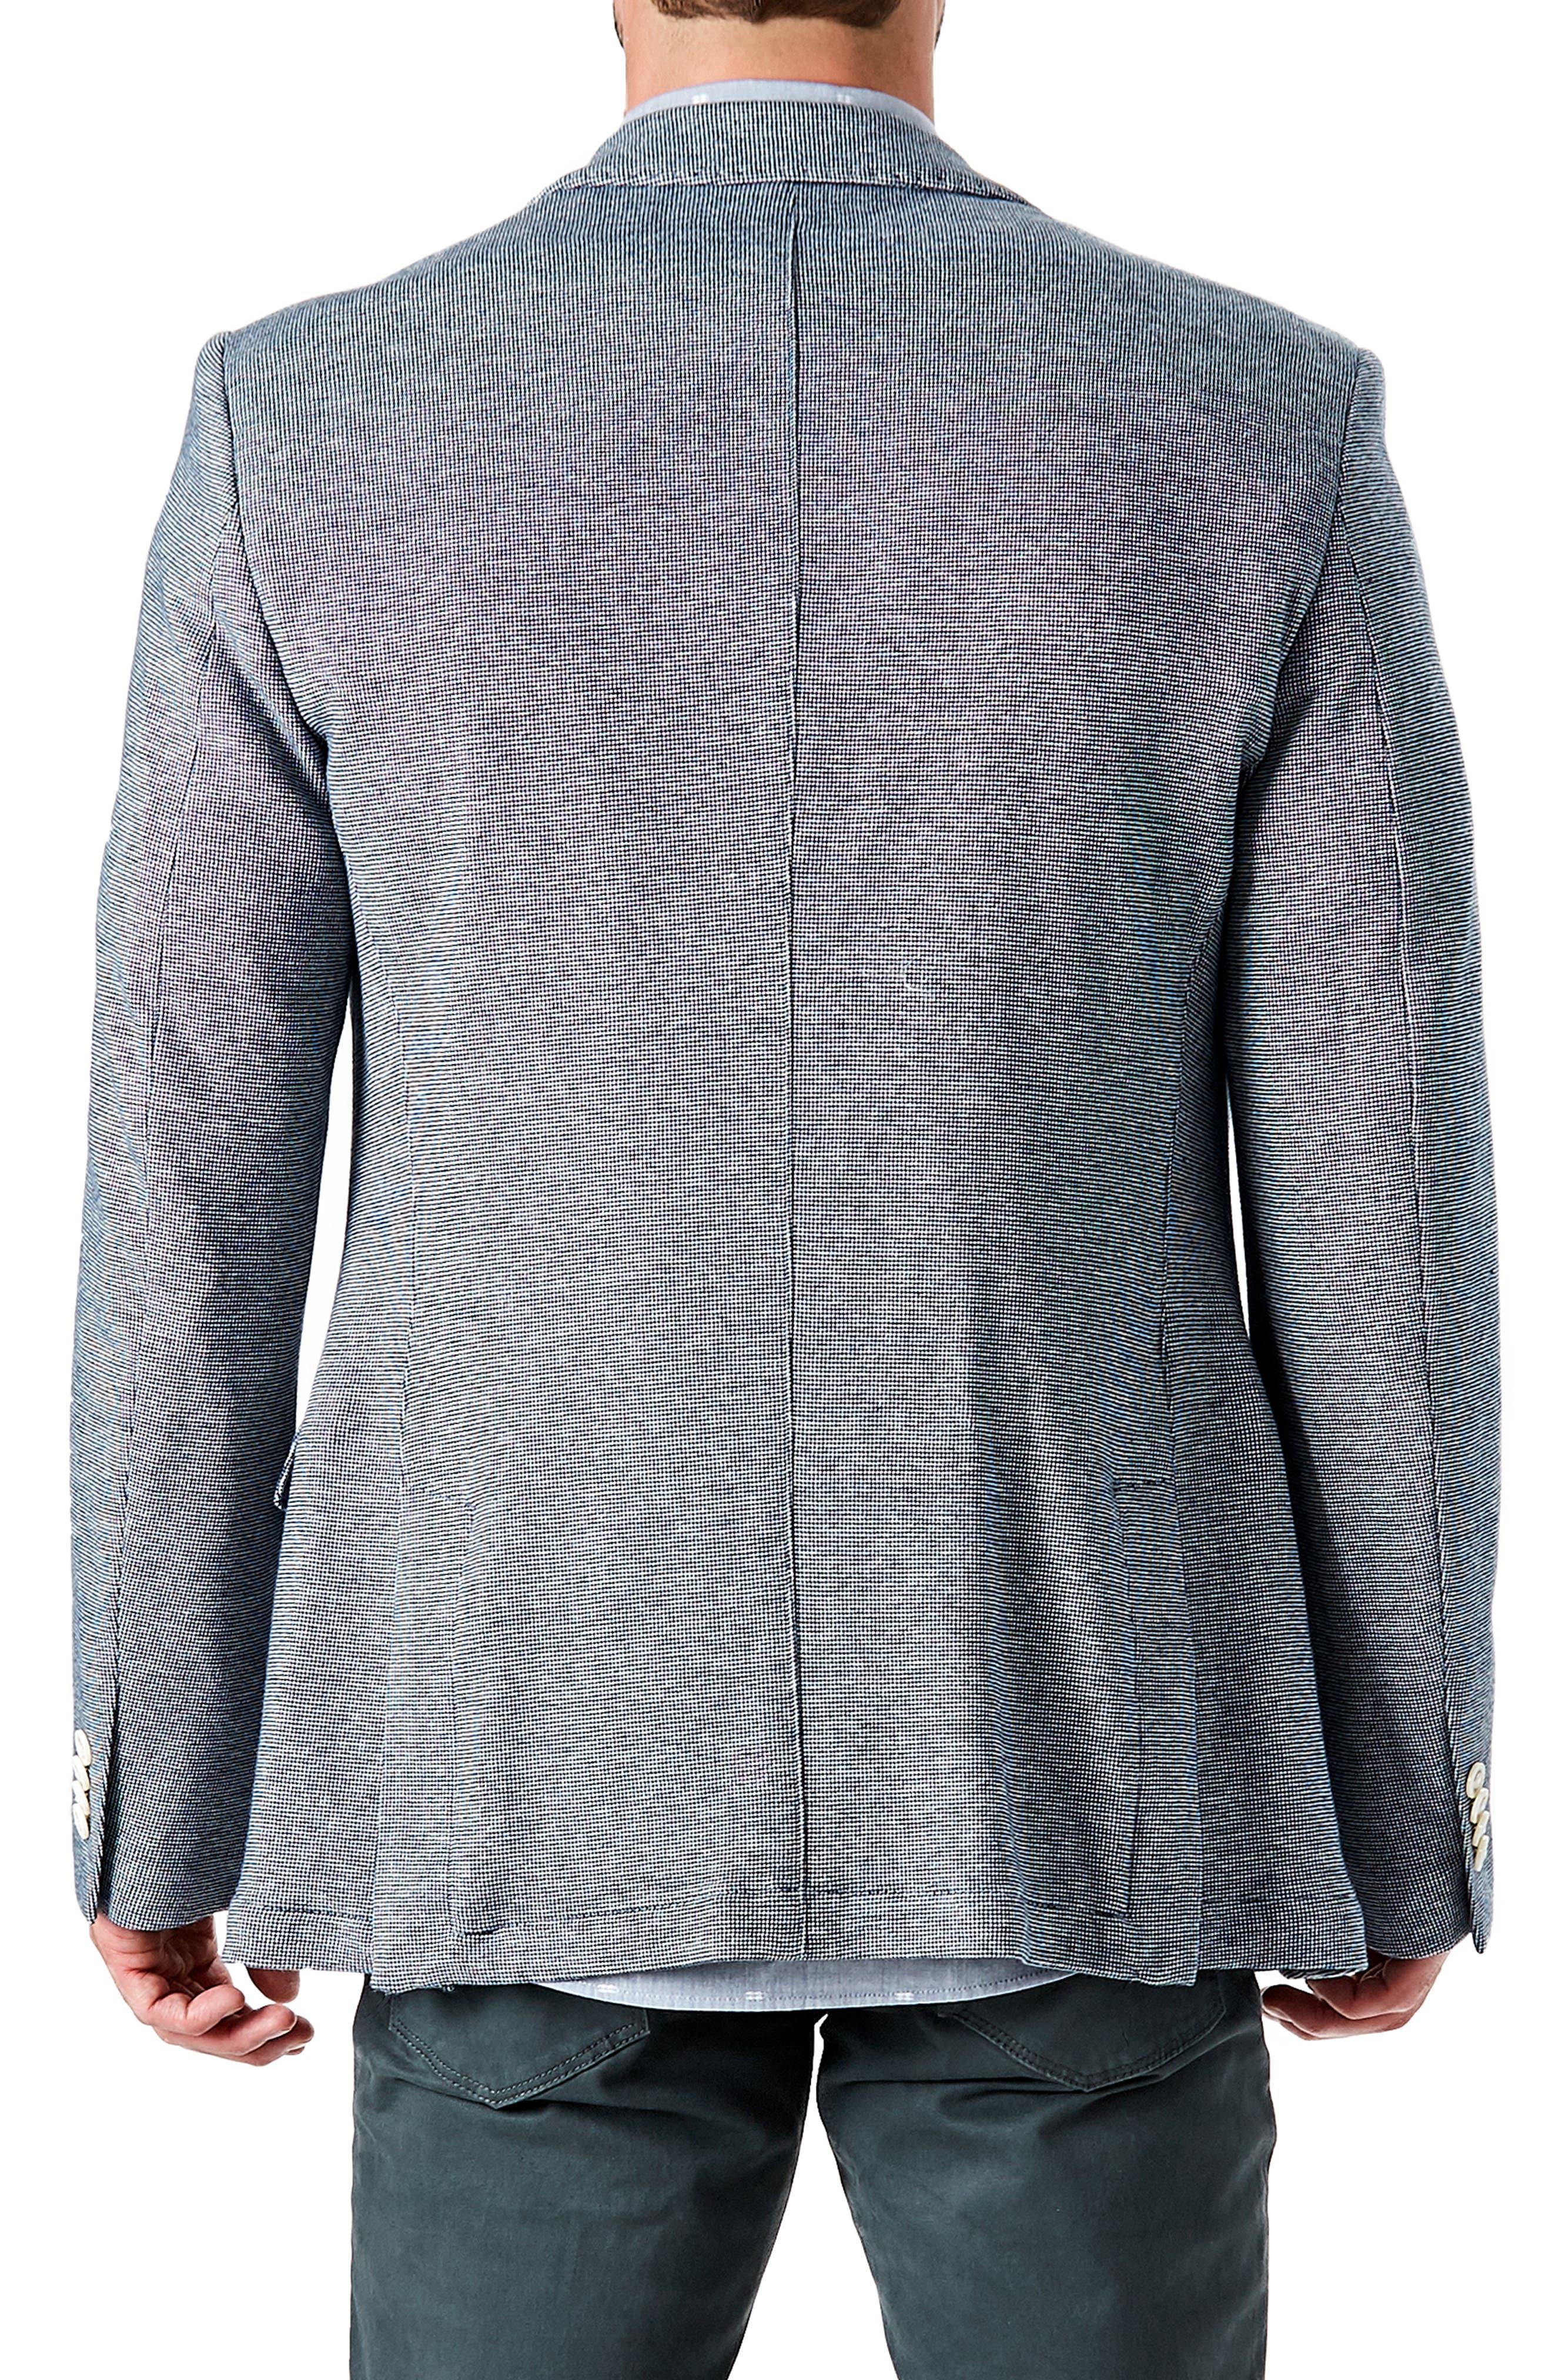 Berlin Trim Fit Sport Coat,                             Alternate thumbnail 2, color,                             NAVY